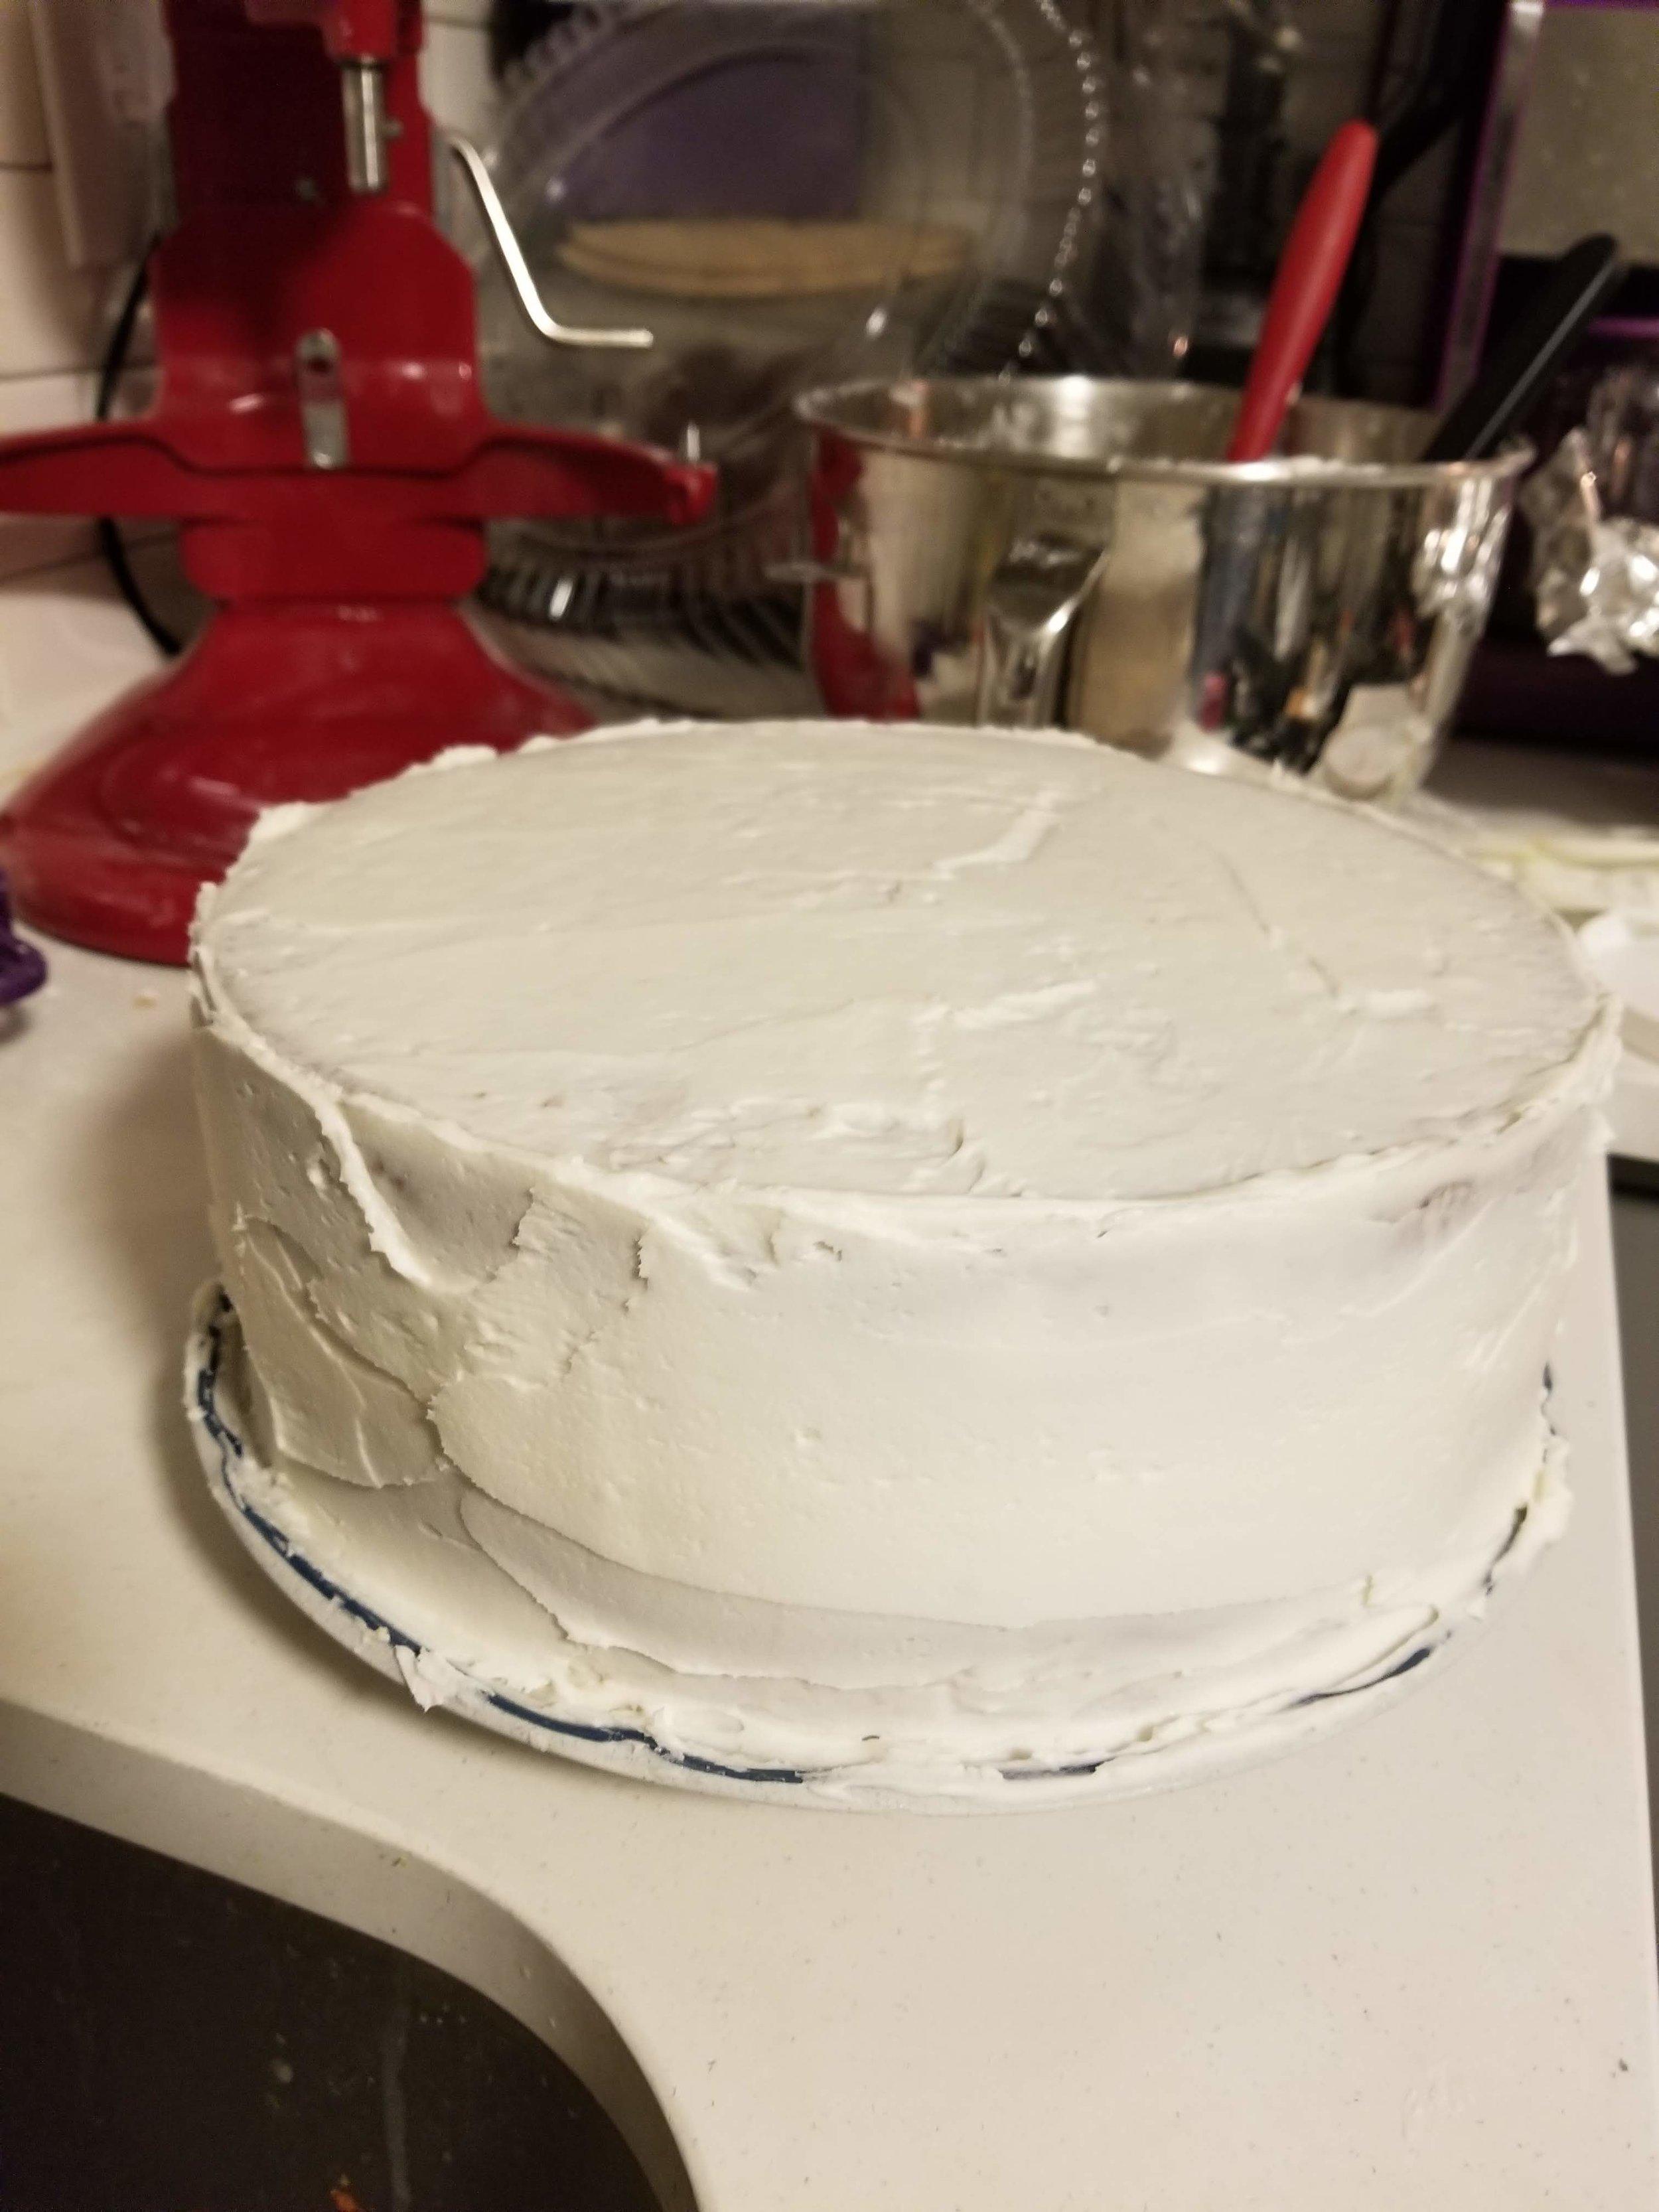 pre-decorating son's 2nd birthday cake